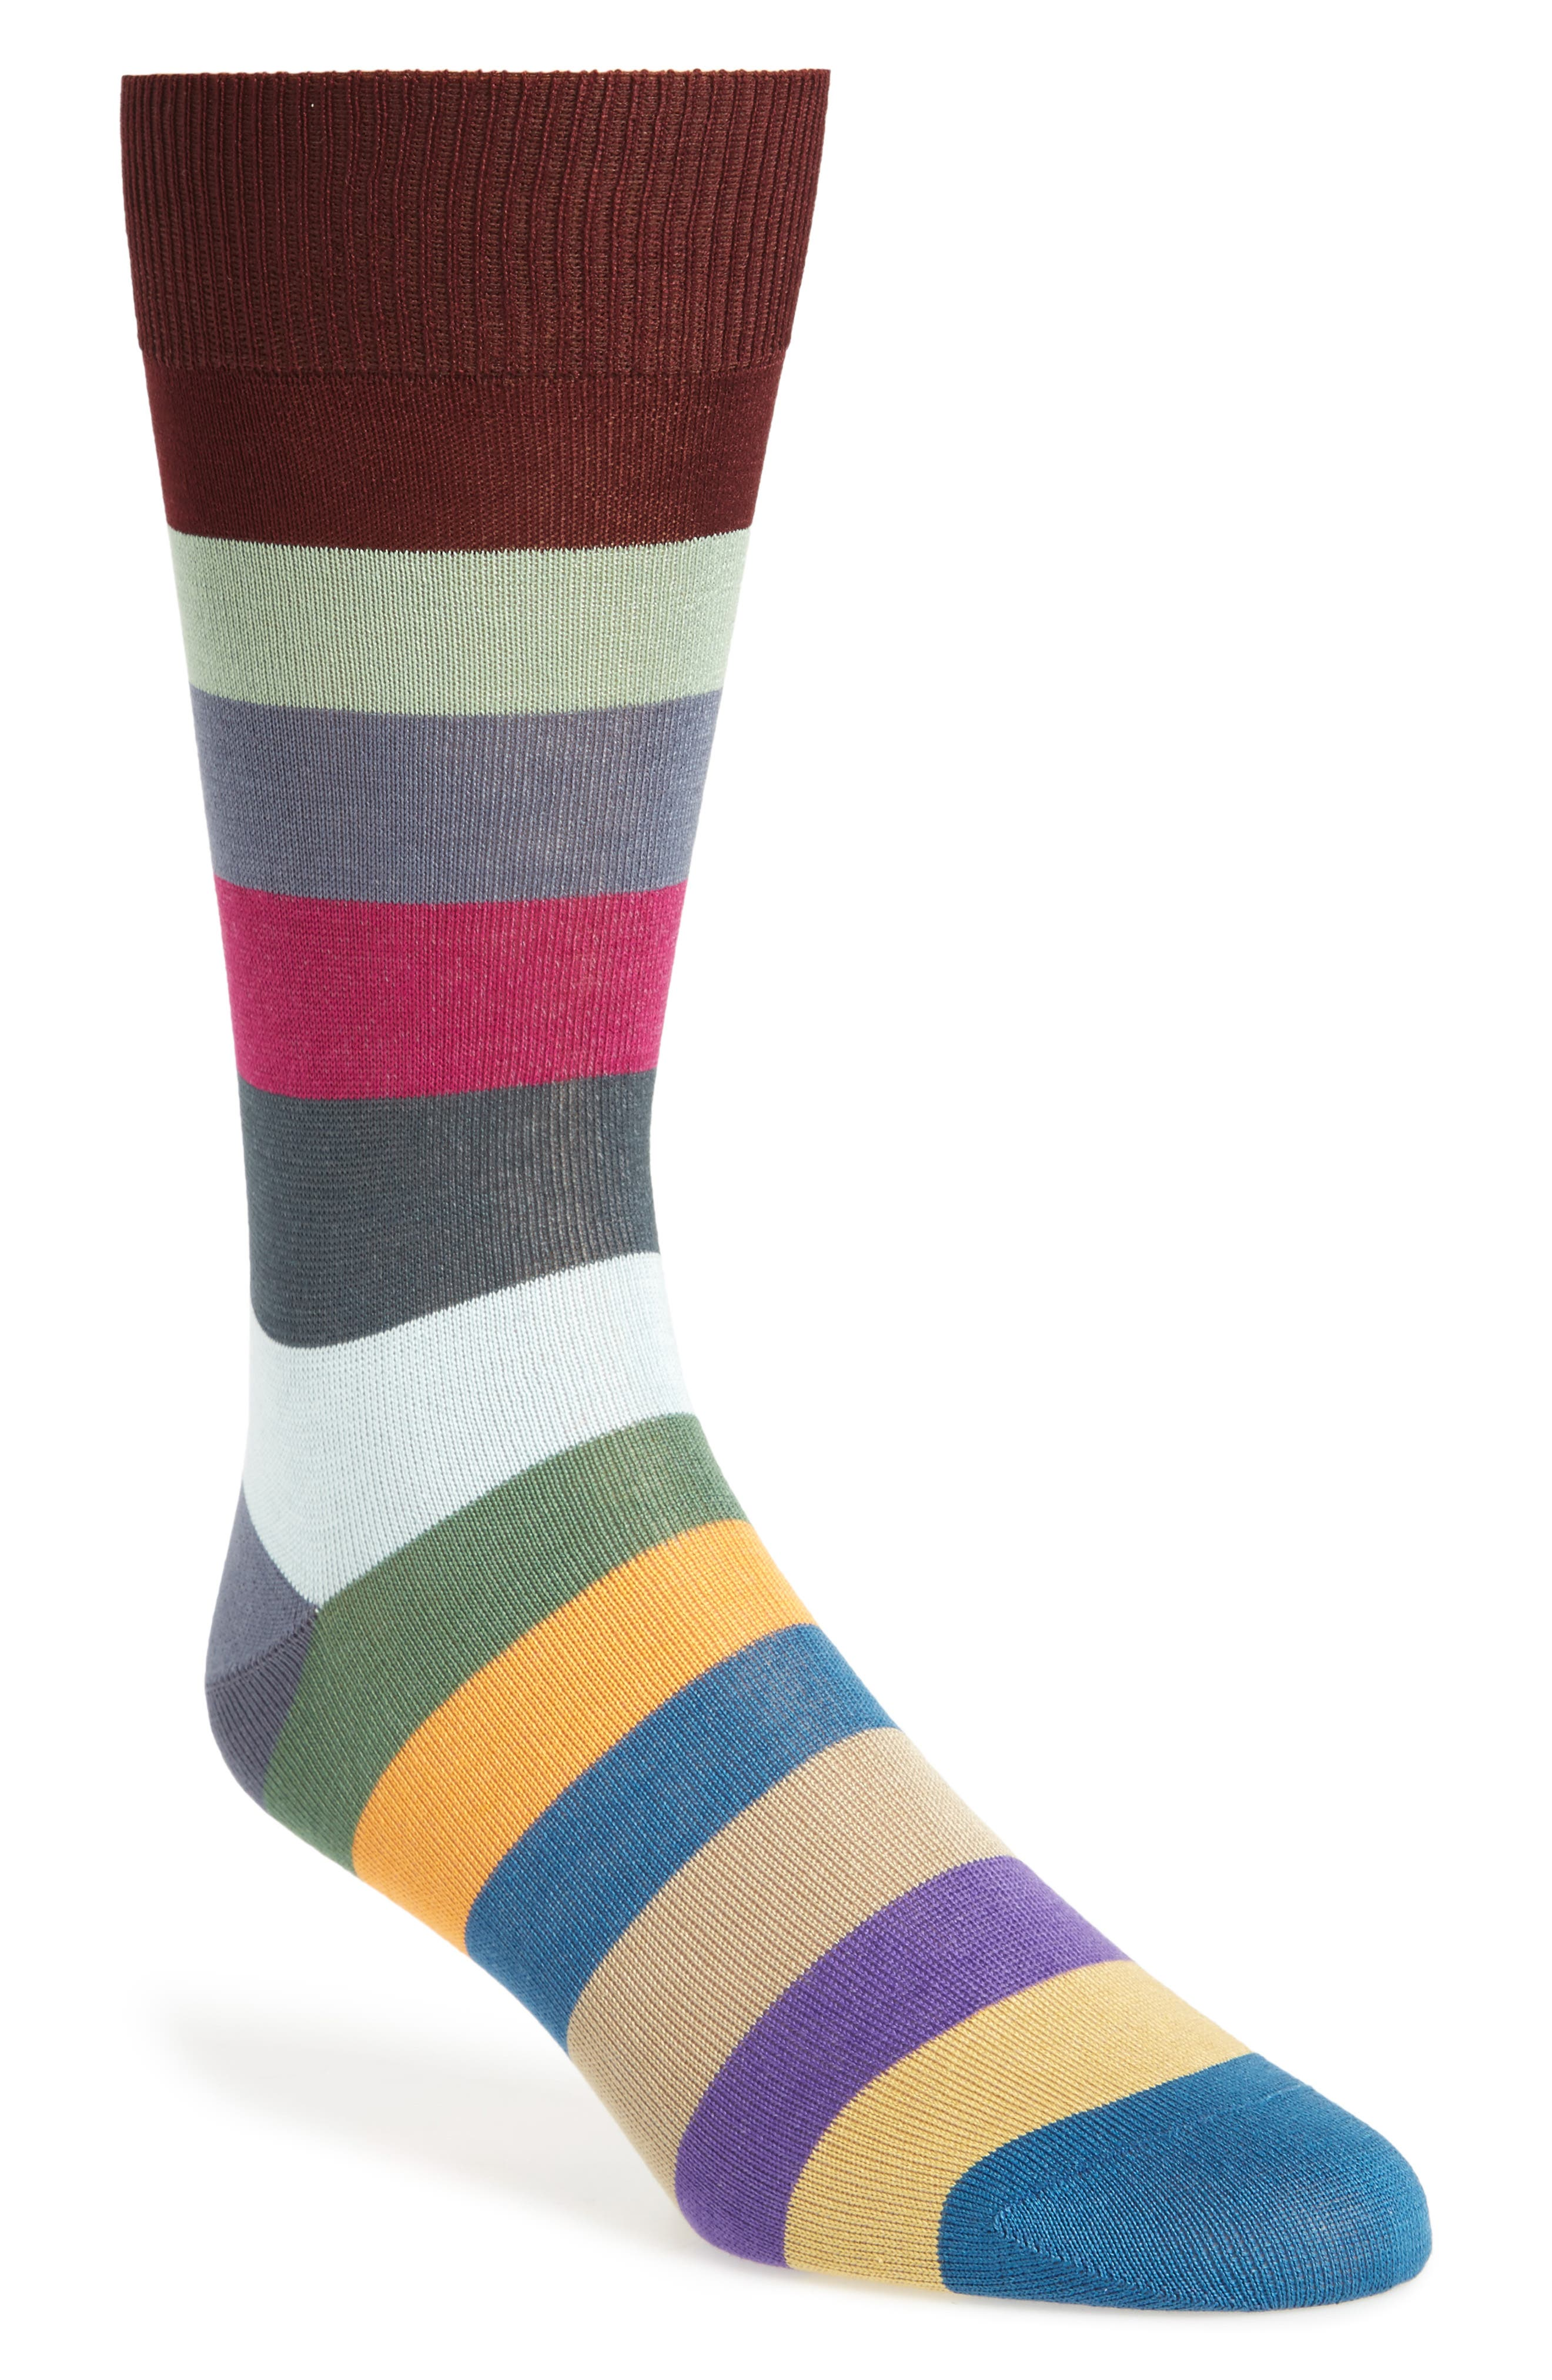 Paul Smith Tie Stripe Socks